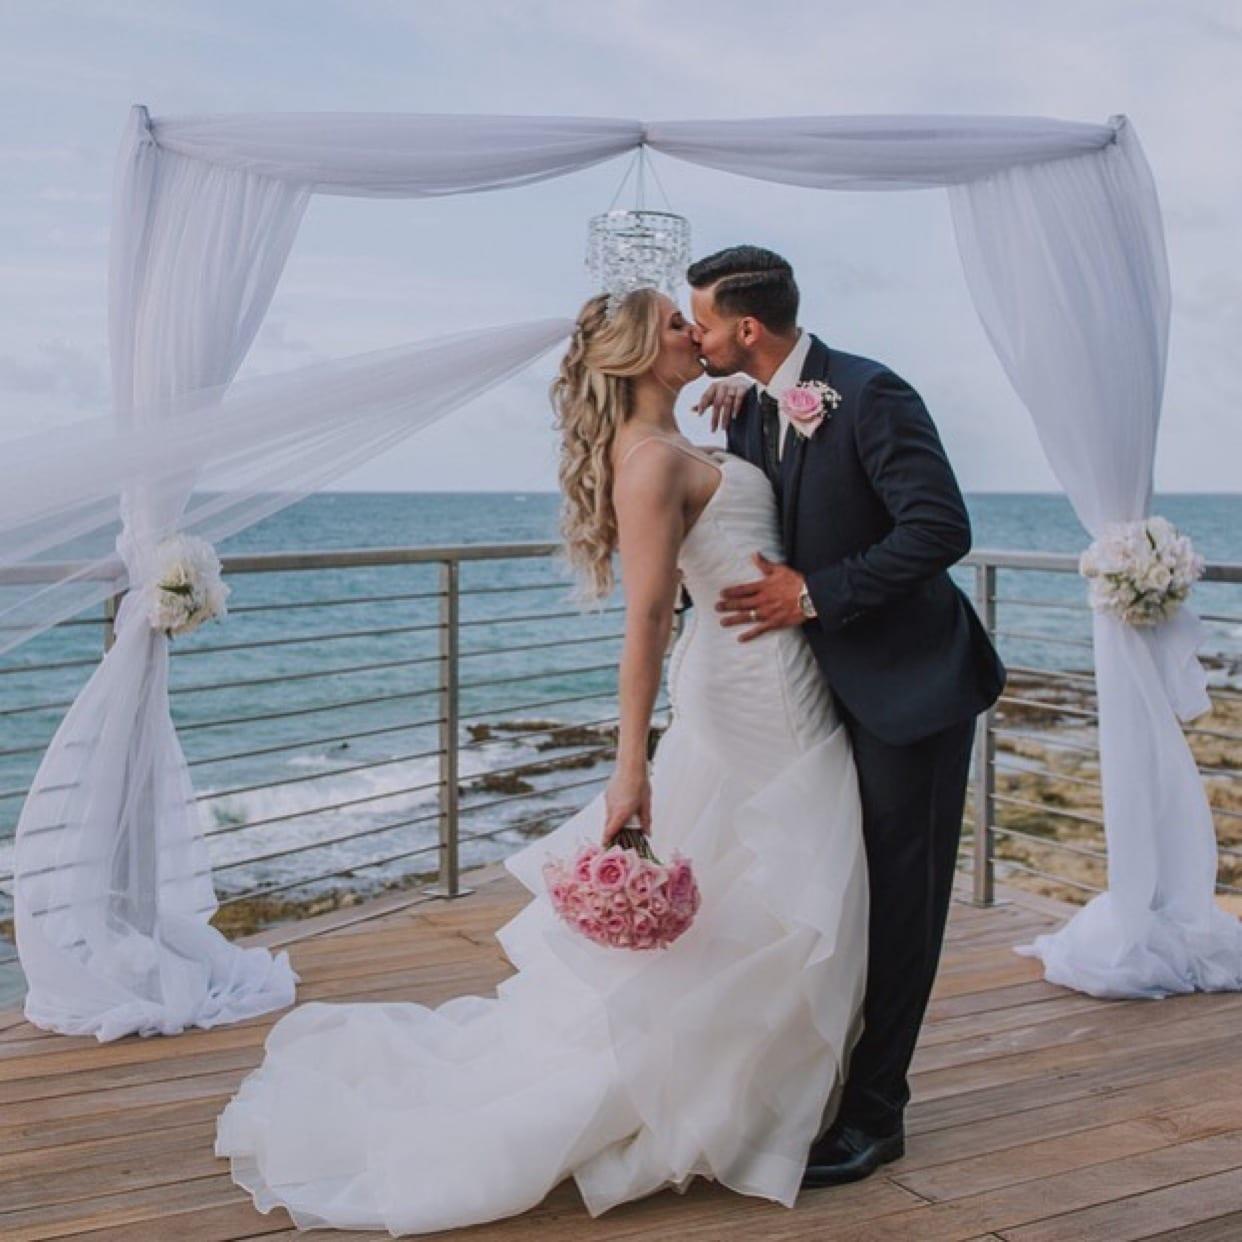 A just married couple at an outdoor wedding venue at Condado Ocean Club